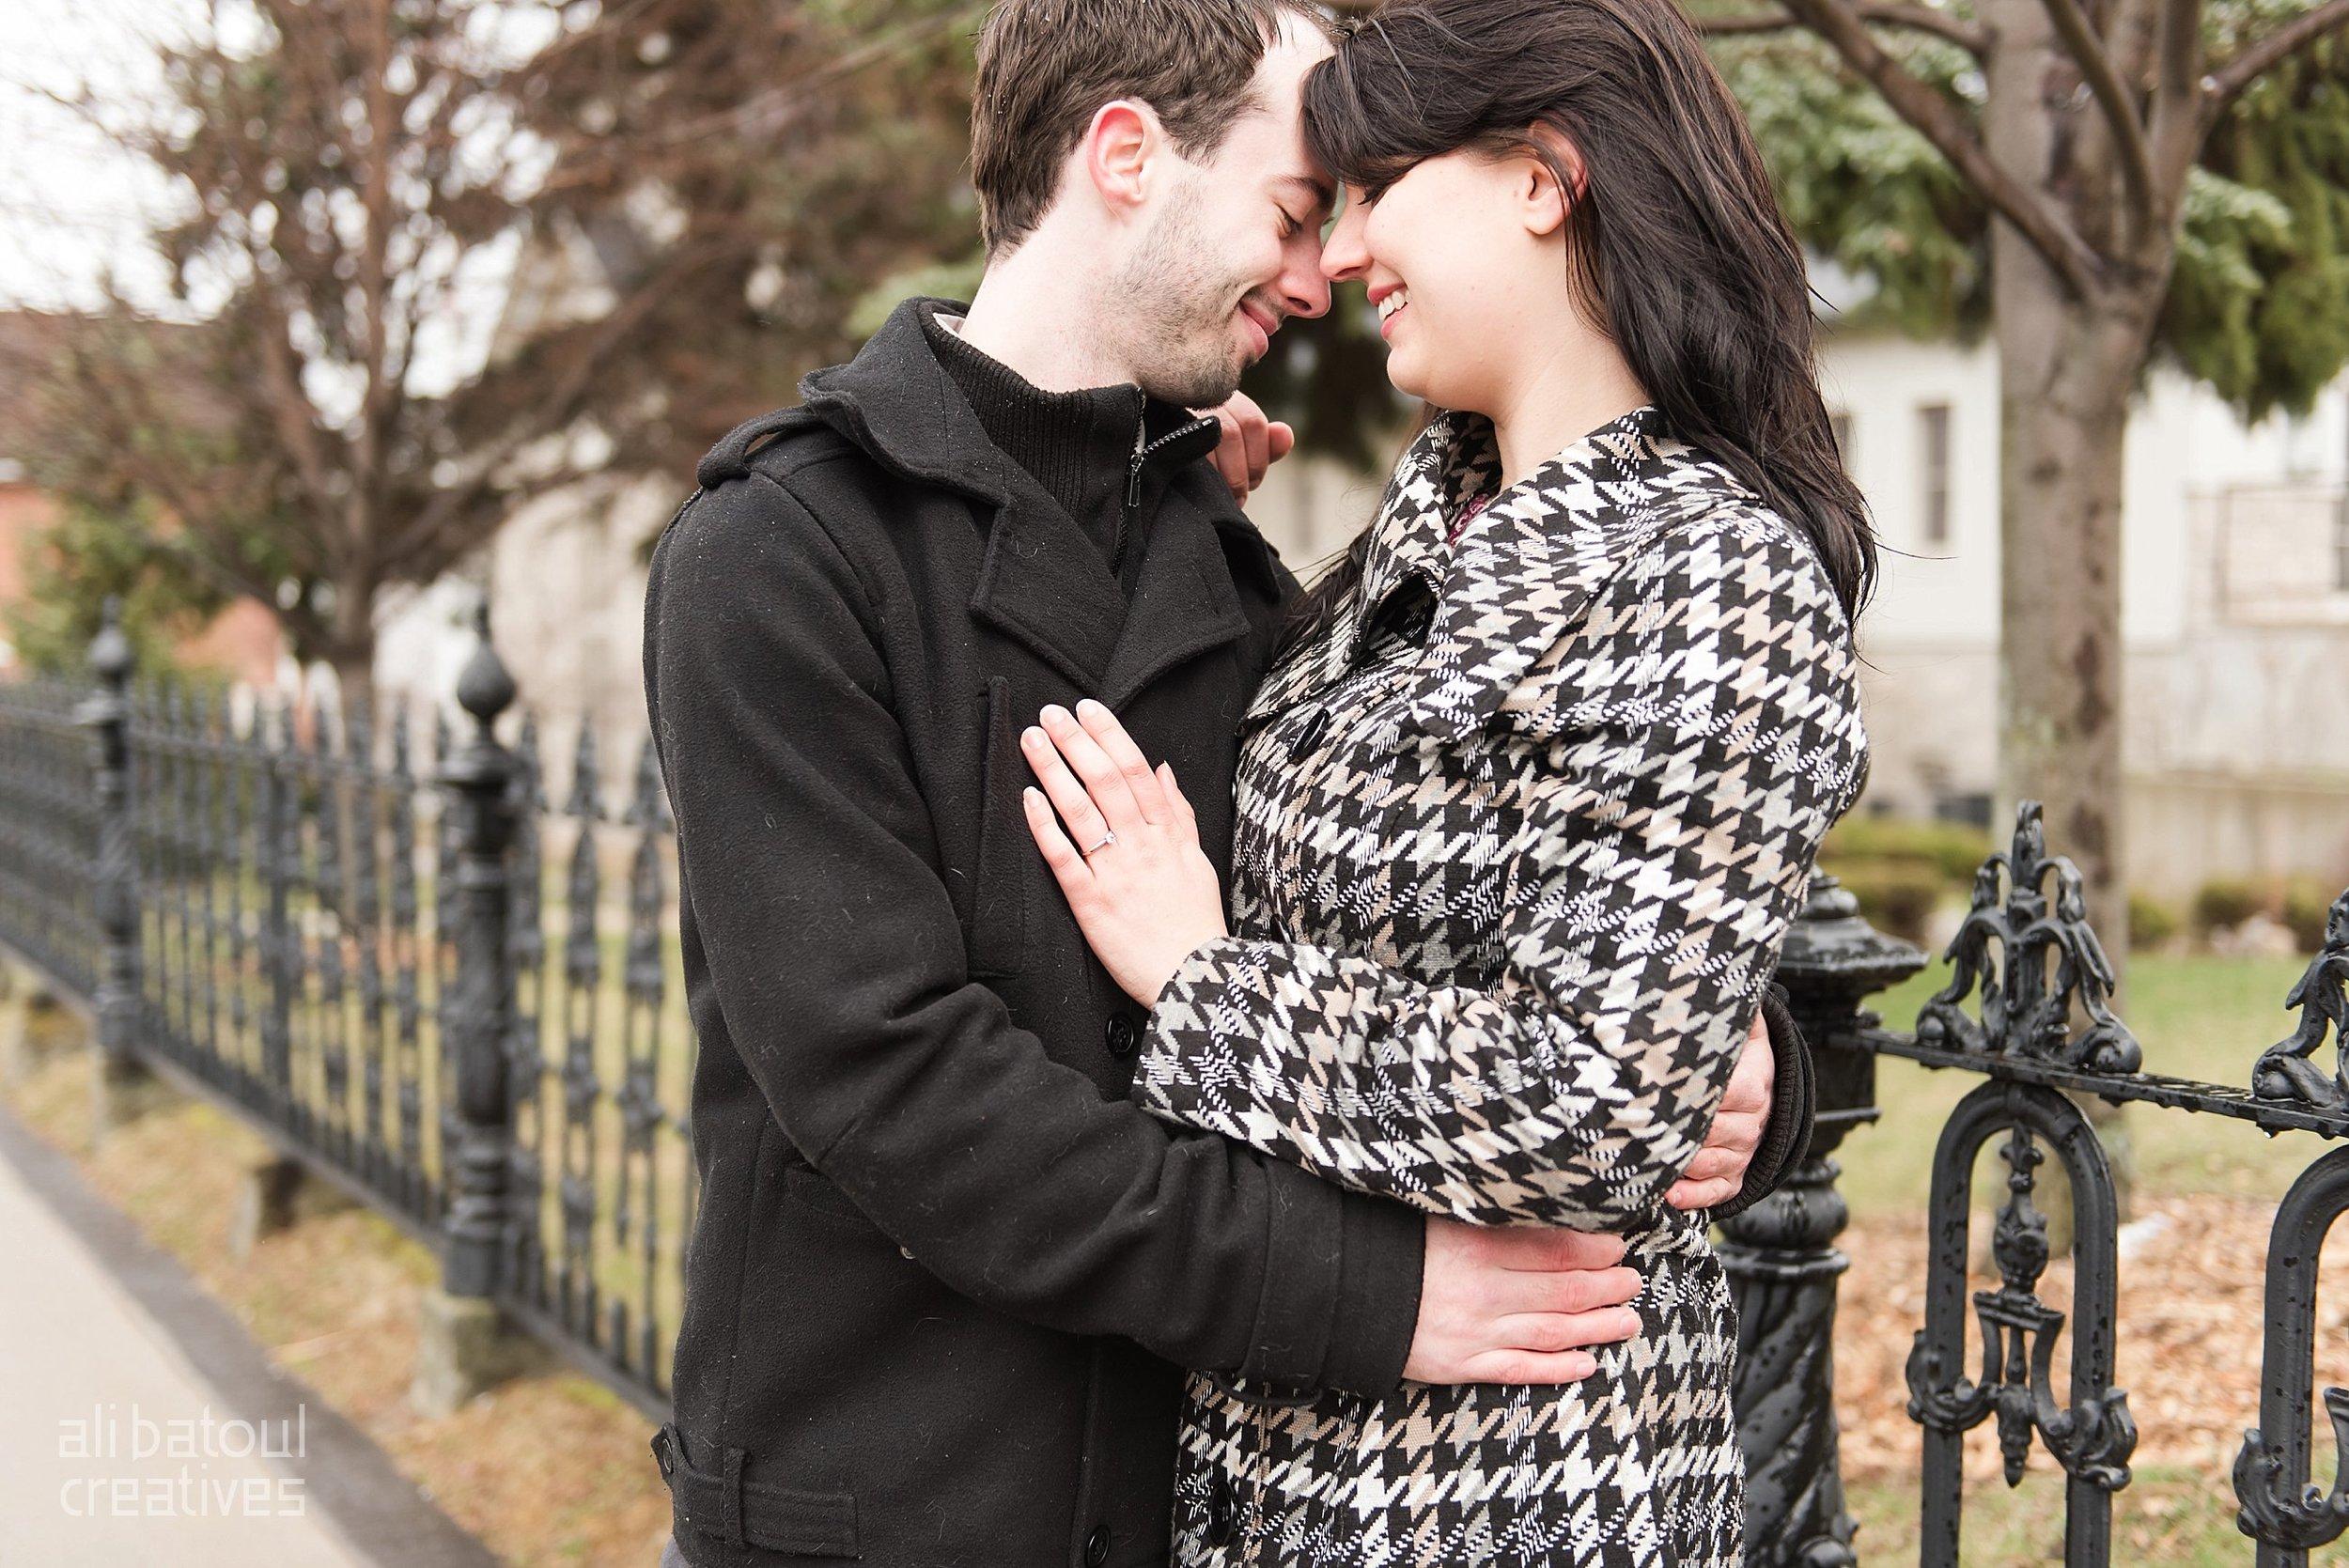 Ottawa Wedding Photography - Ali Batoul Creatives_0030.jpg